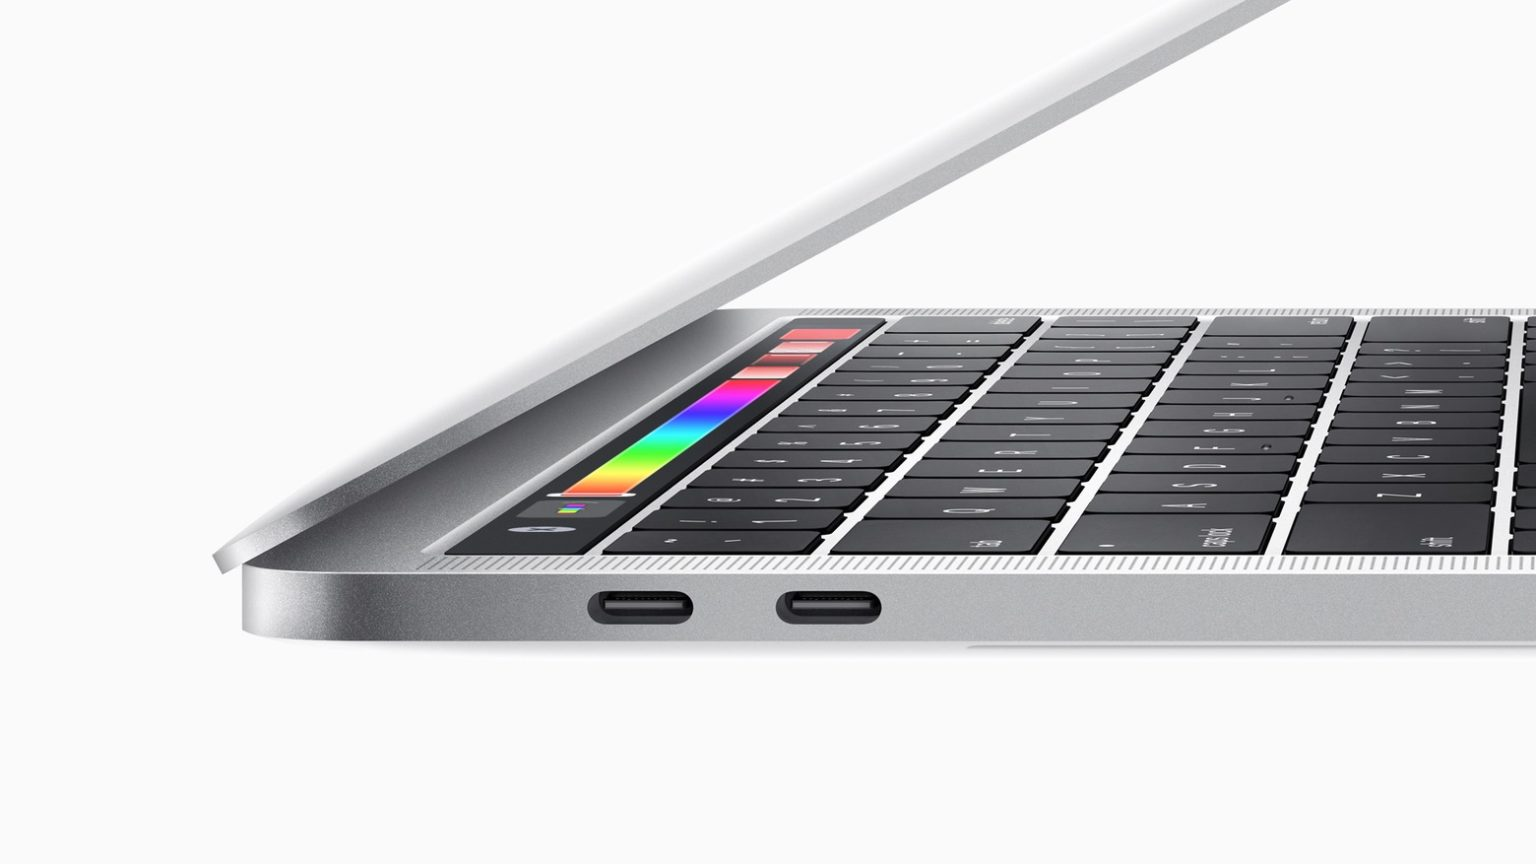 MacBook Thunderbolt 3 ports